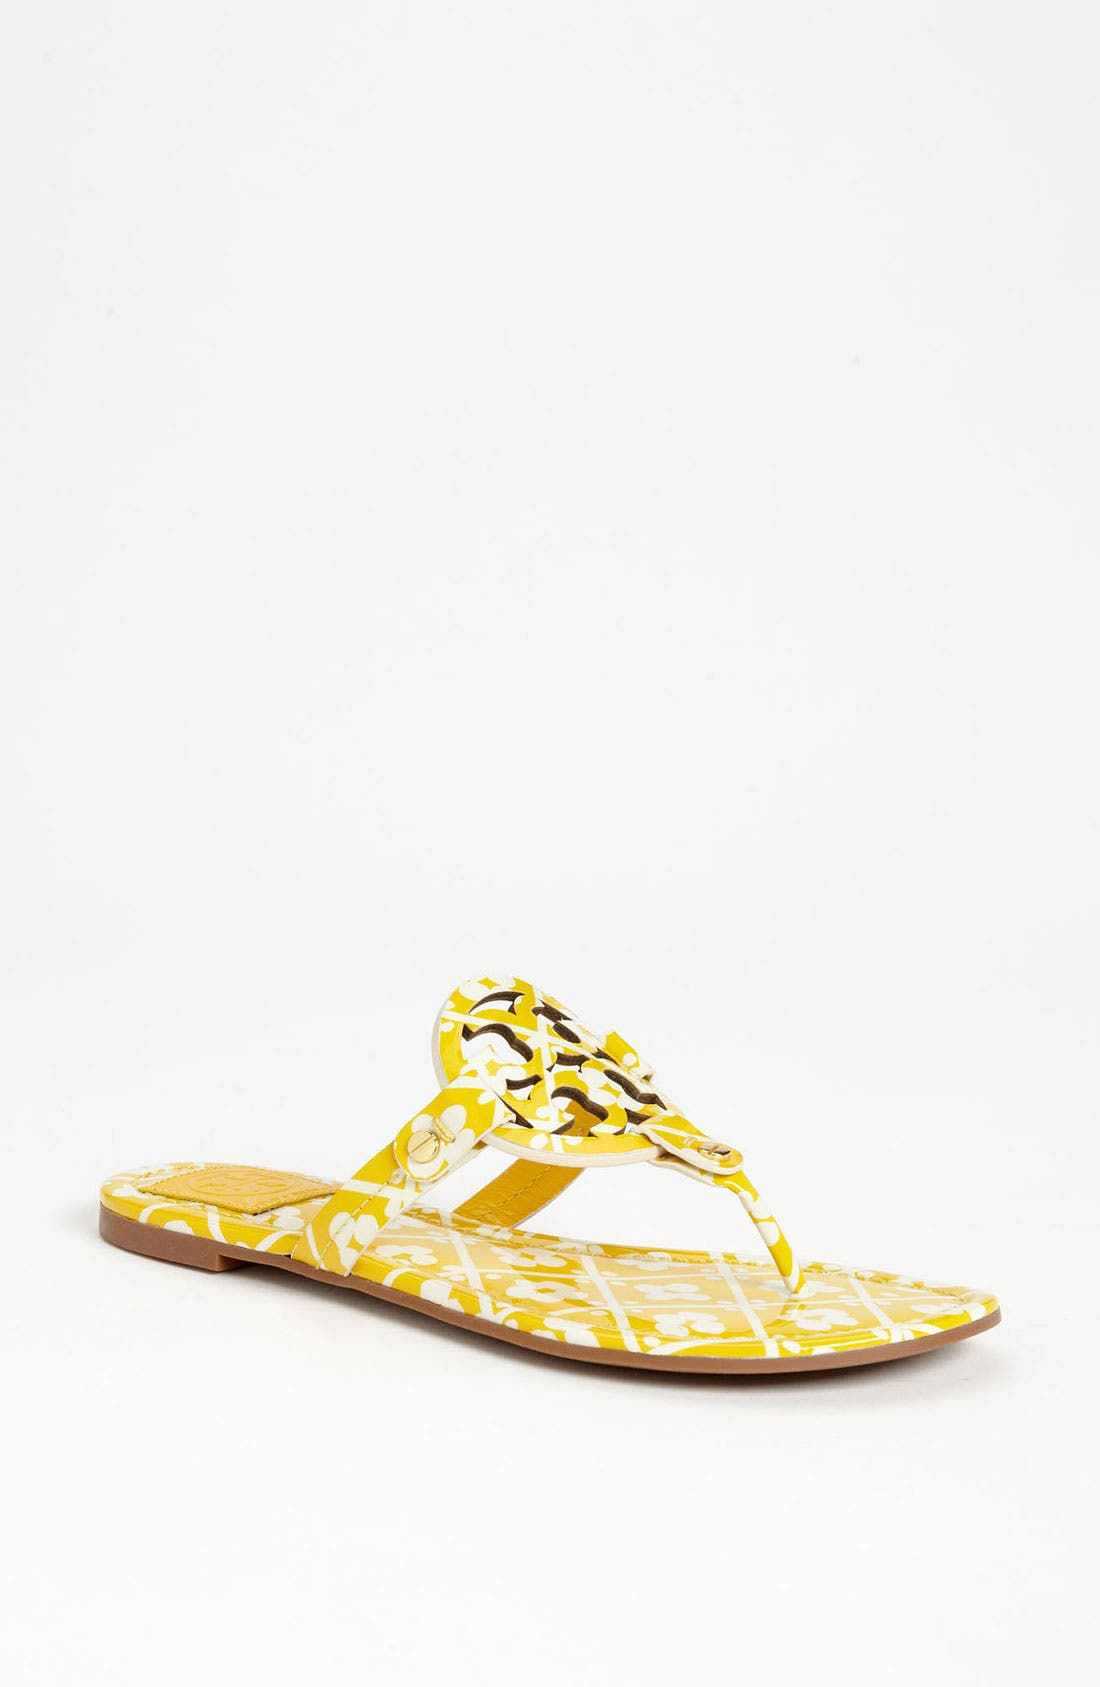 Main Image - Tory Burch 'Miller' Sandal